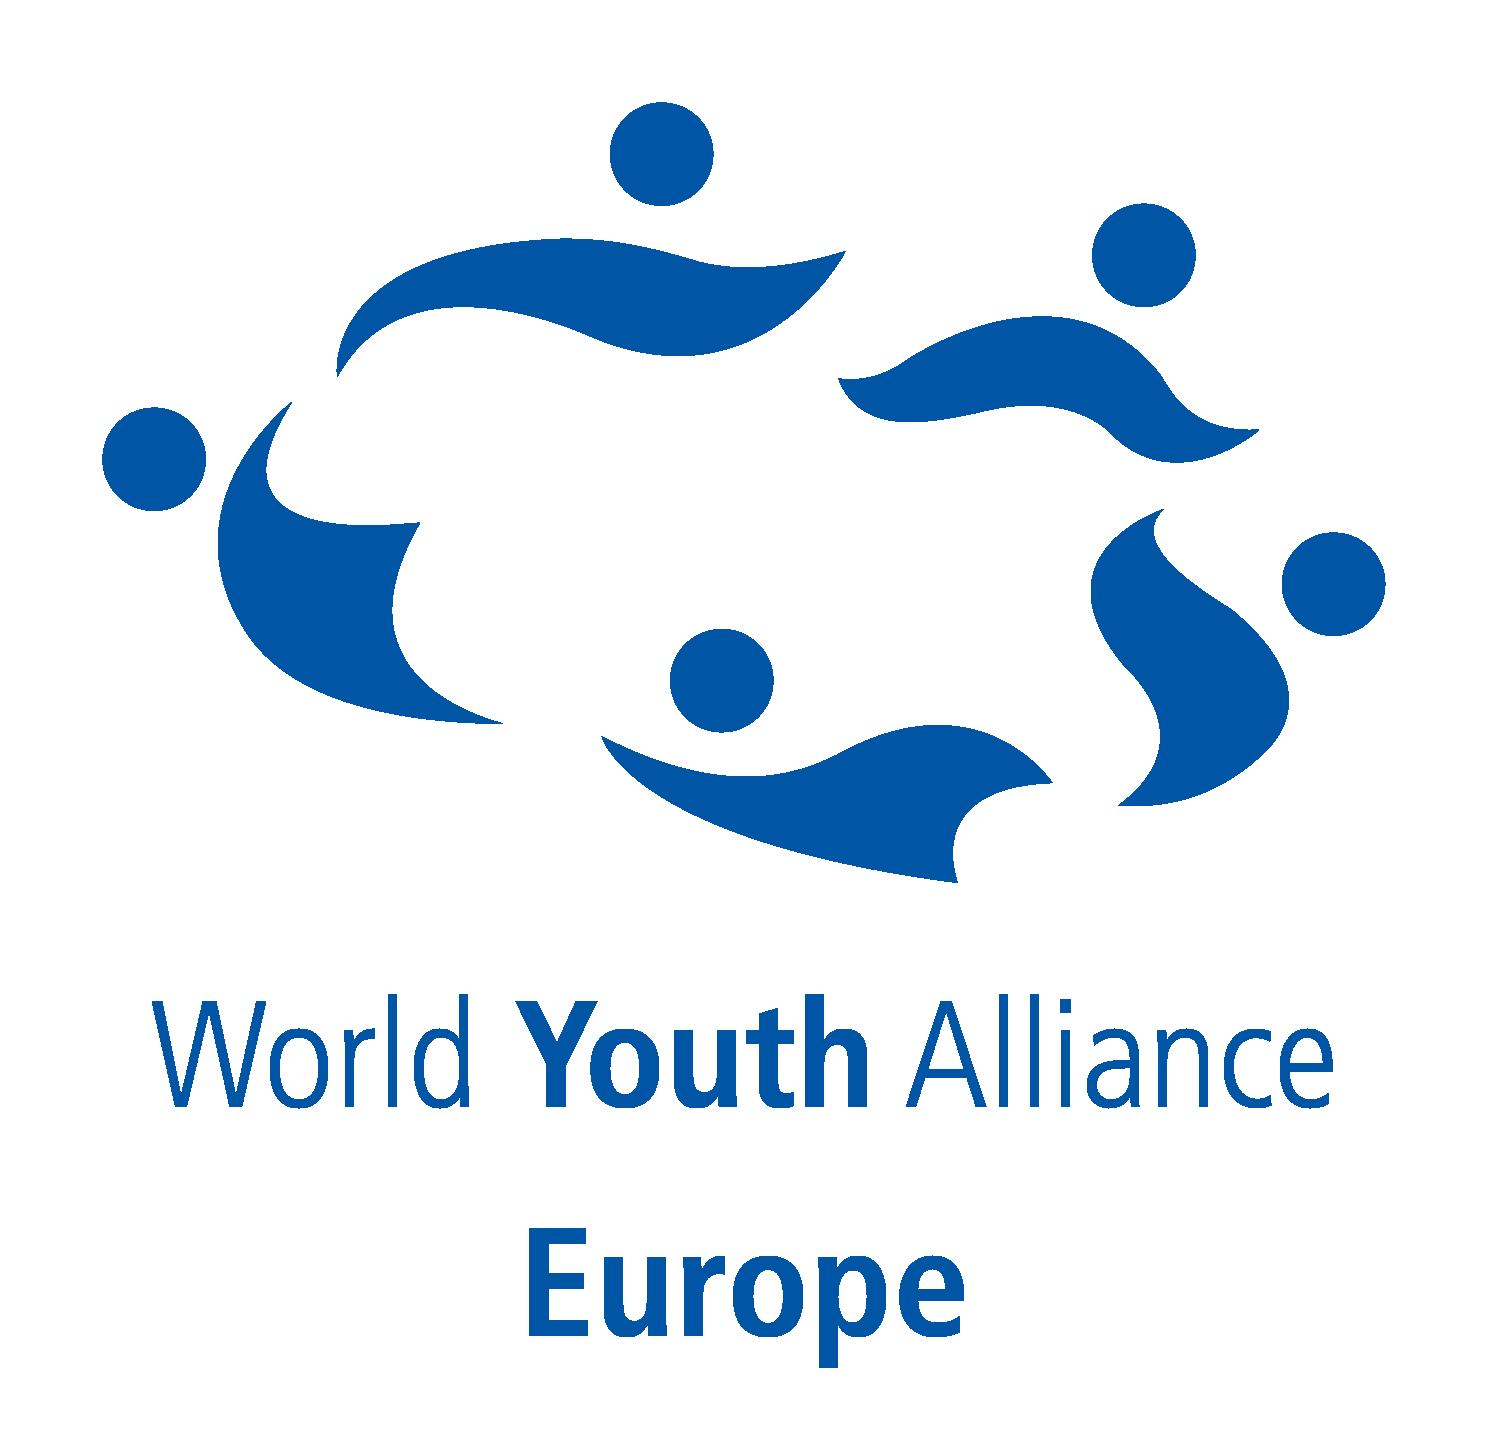 logo for World Youth Alliance - Europe